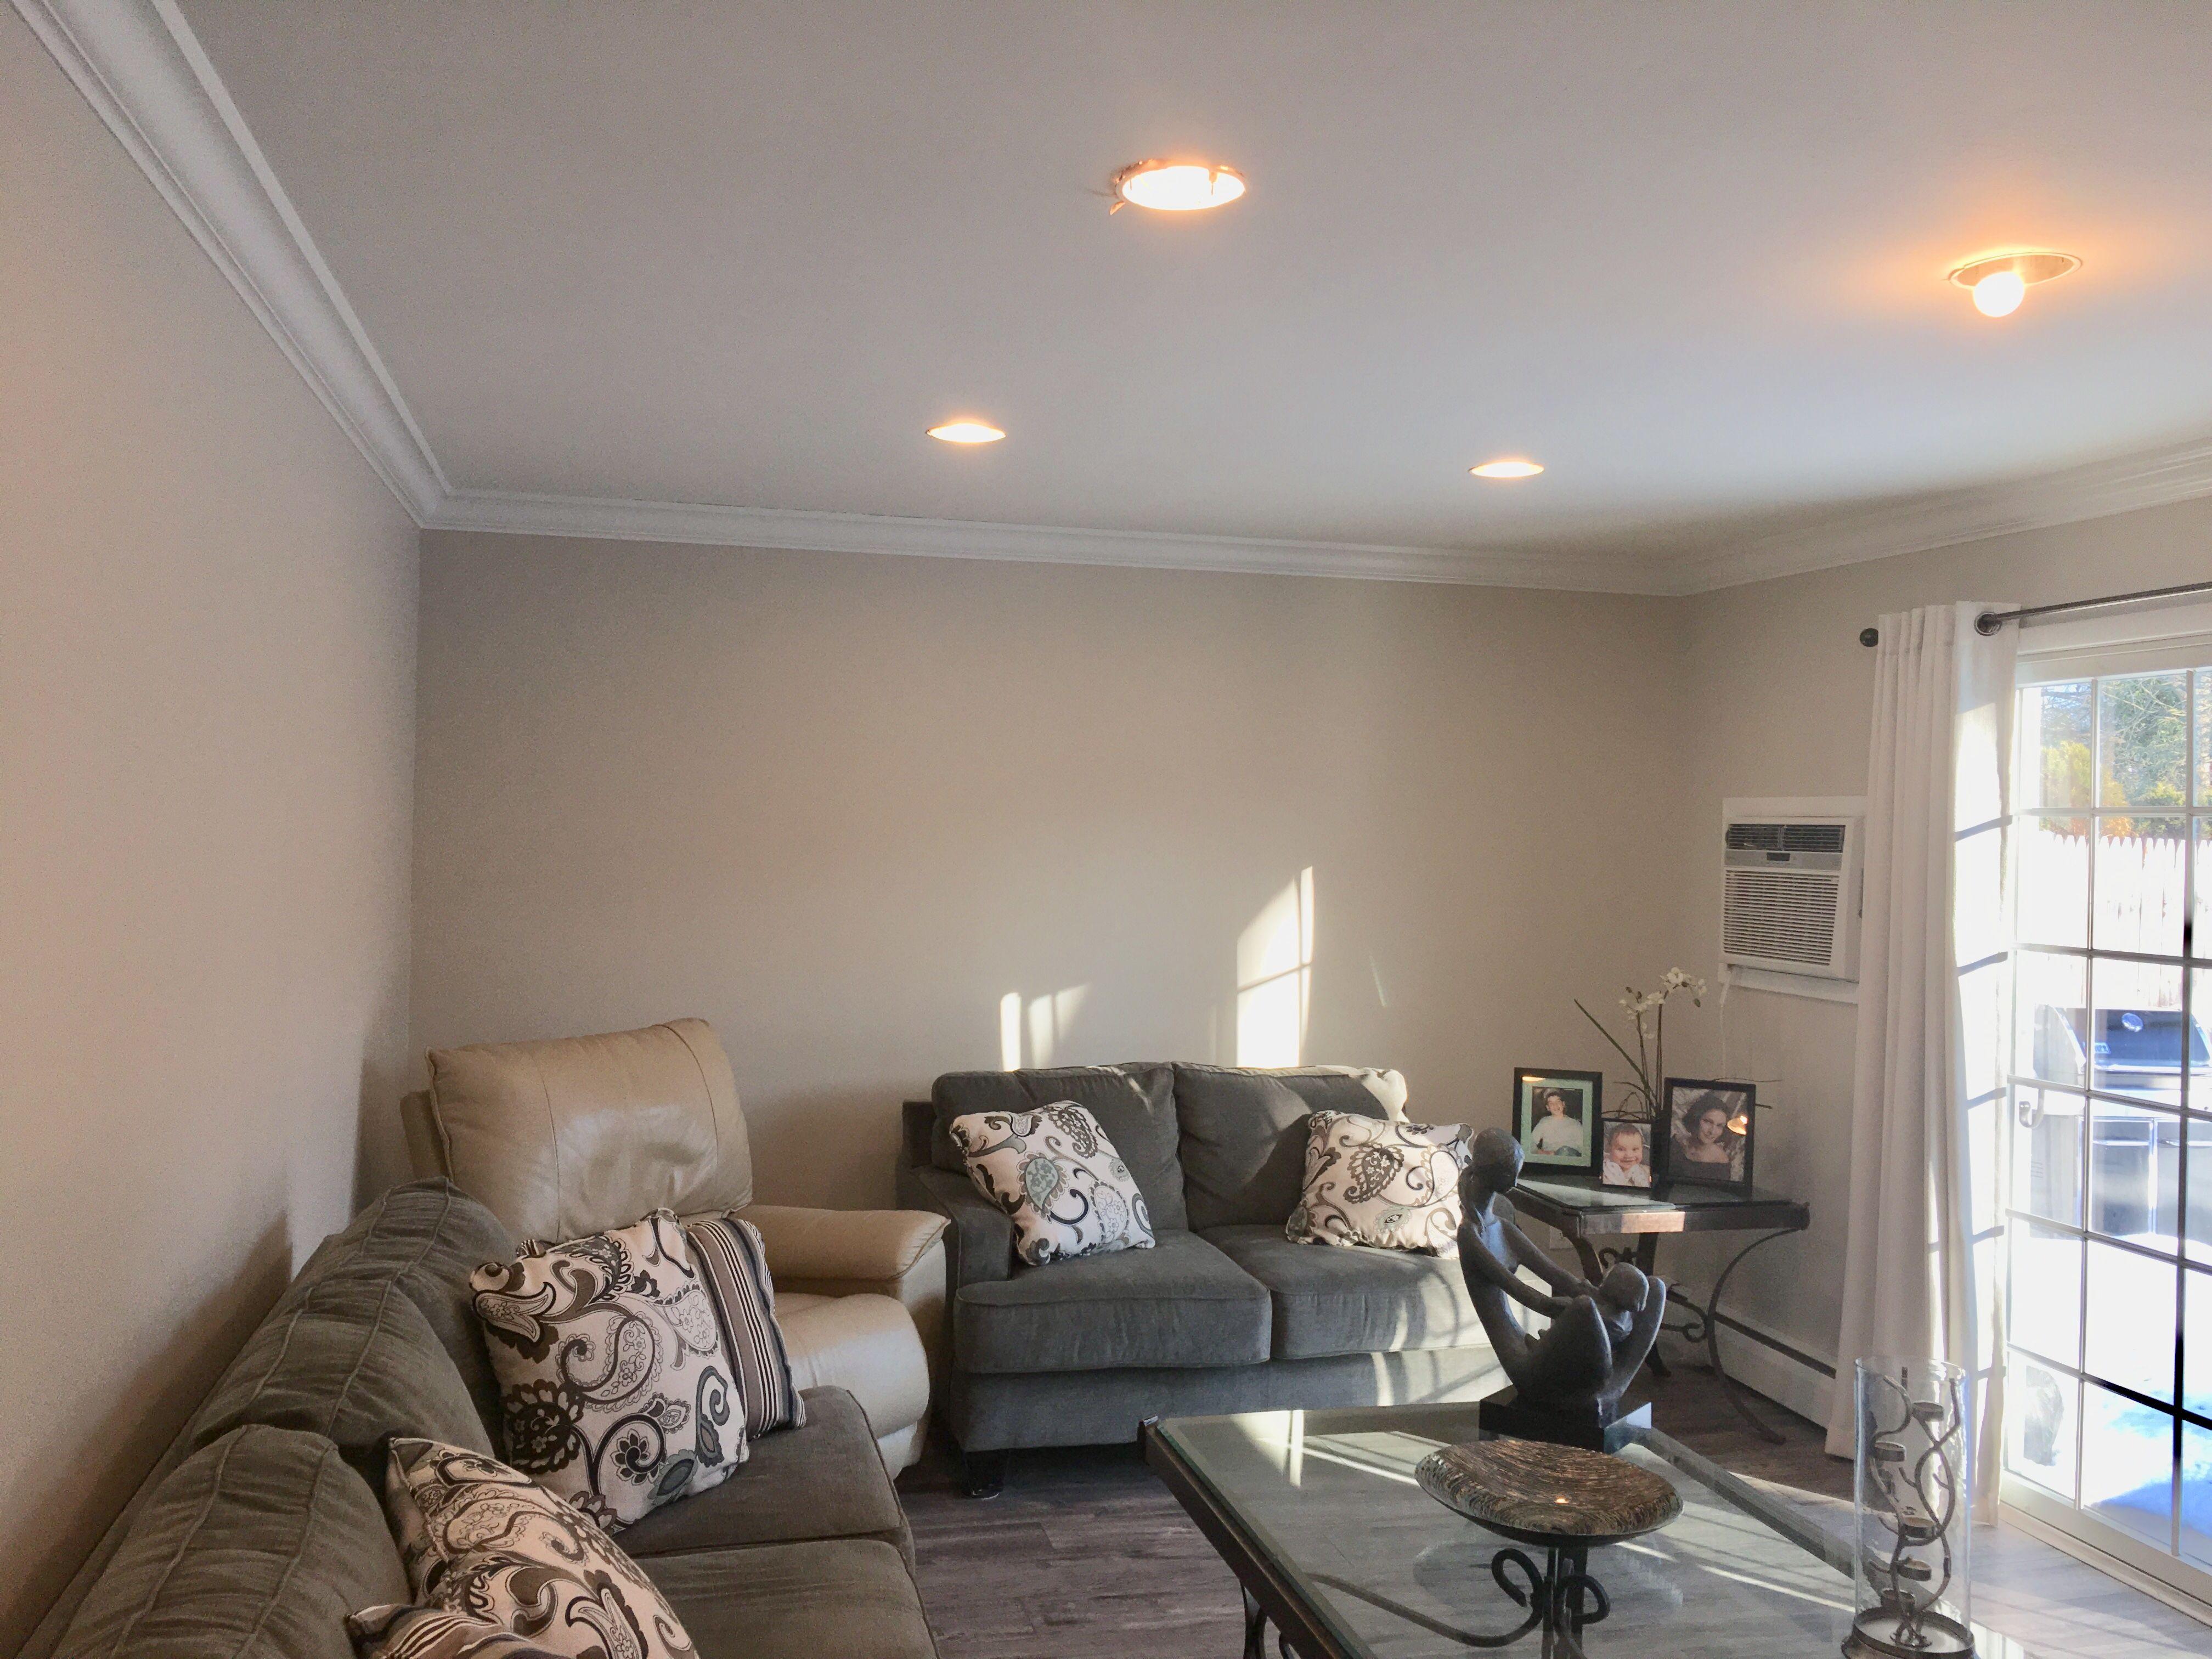 Walls Edgecomb Gray Hc 173 Matte Finish Ceilings Regal Select White Flat Trim Regal Select White Semi Gloss Room Colors Grey Paint Colors Grey Paint